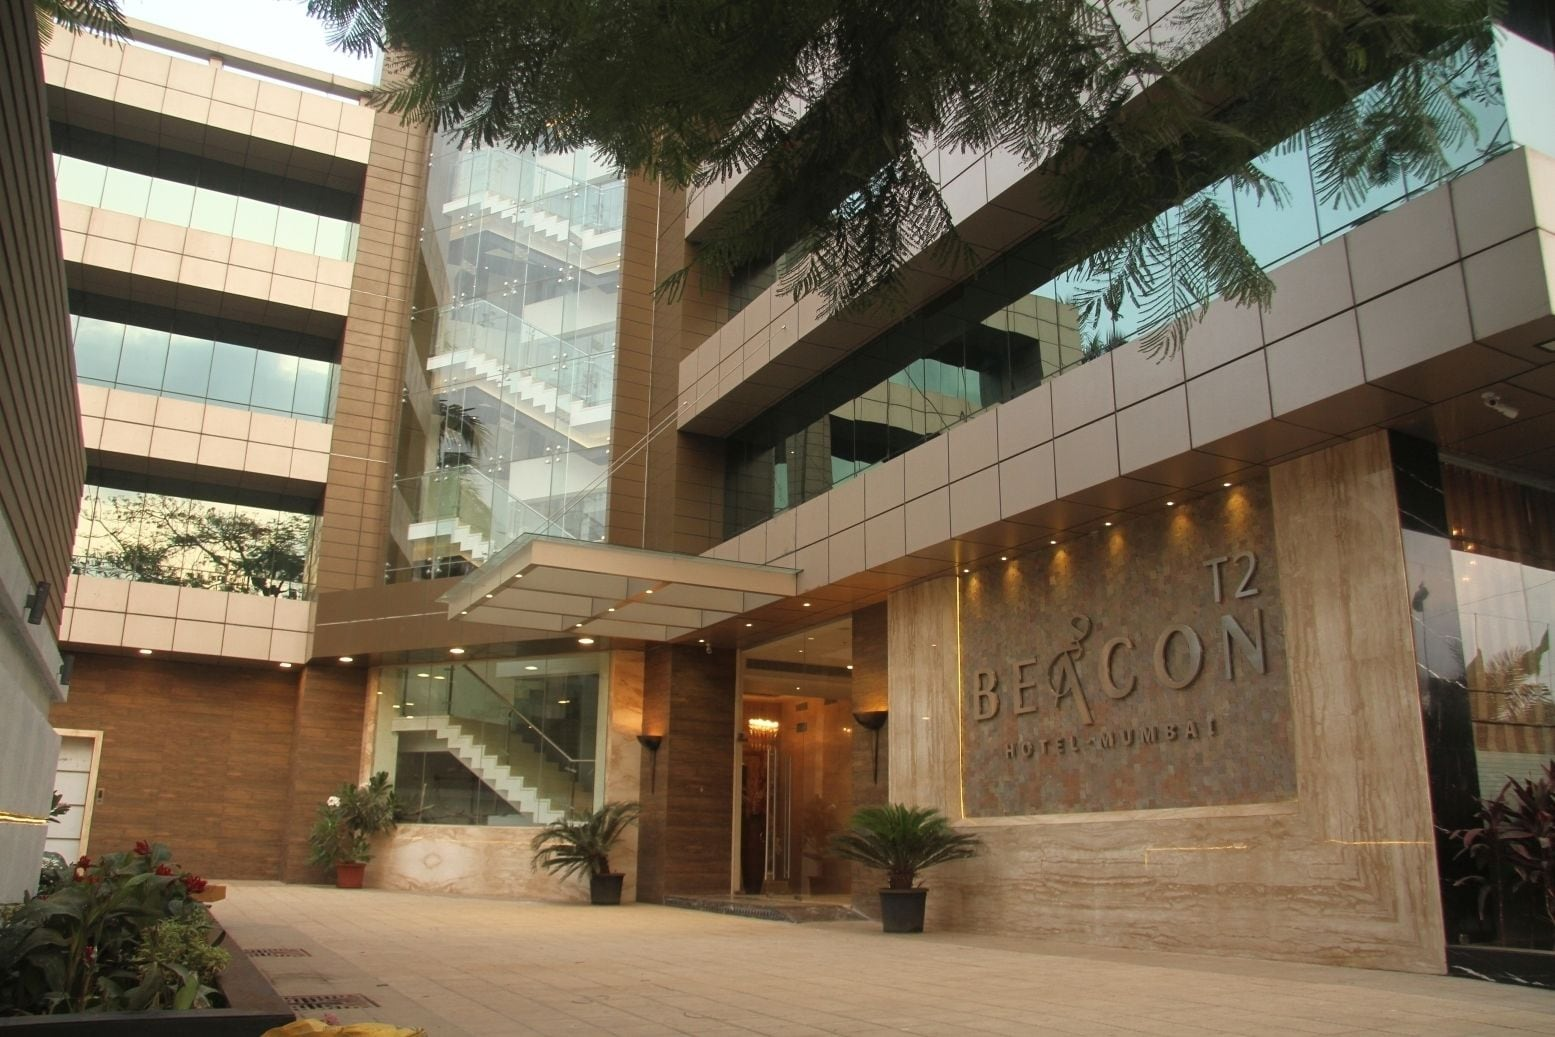 T2 Beacon Hotel